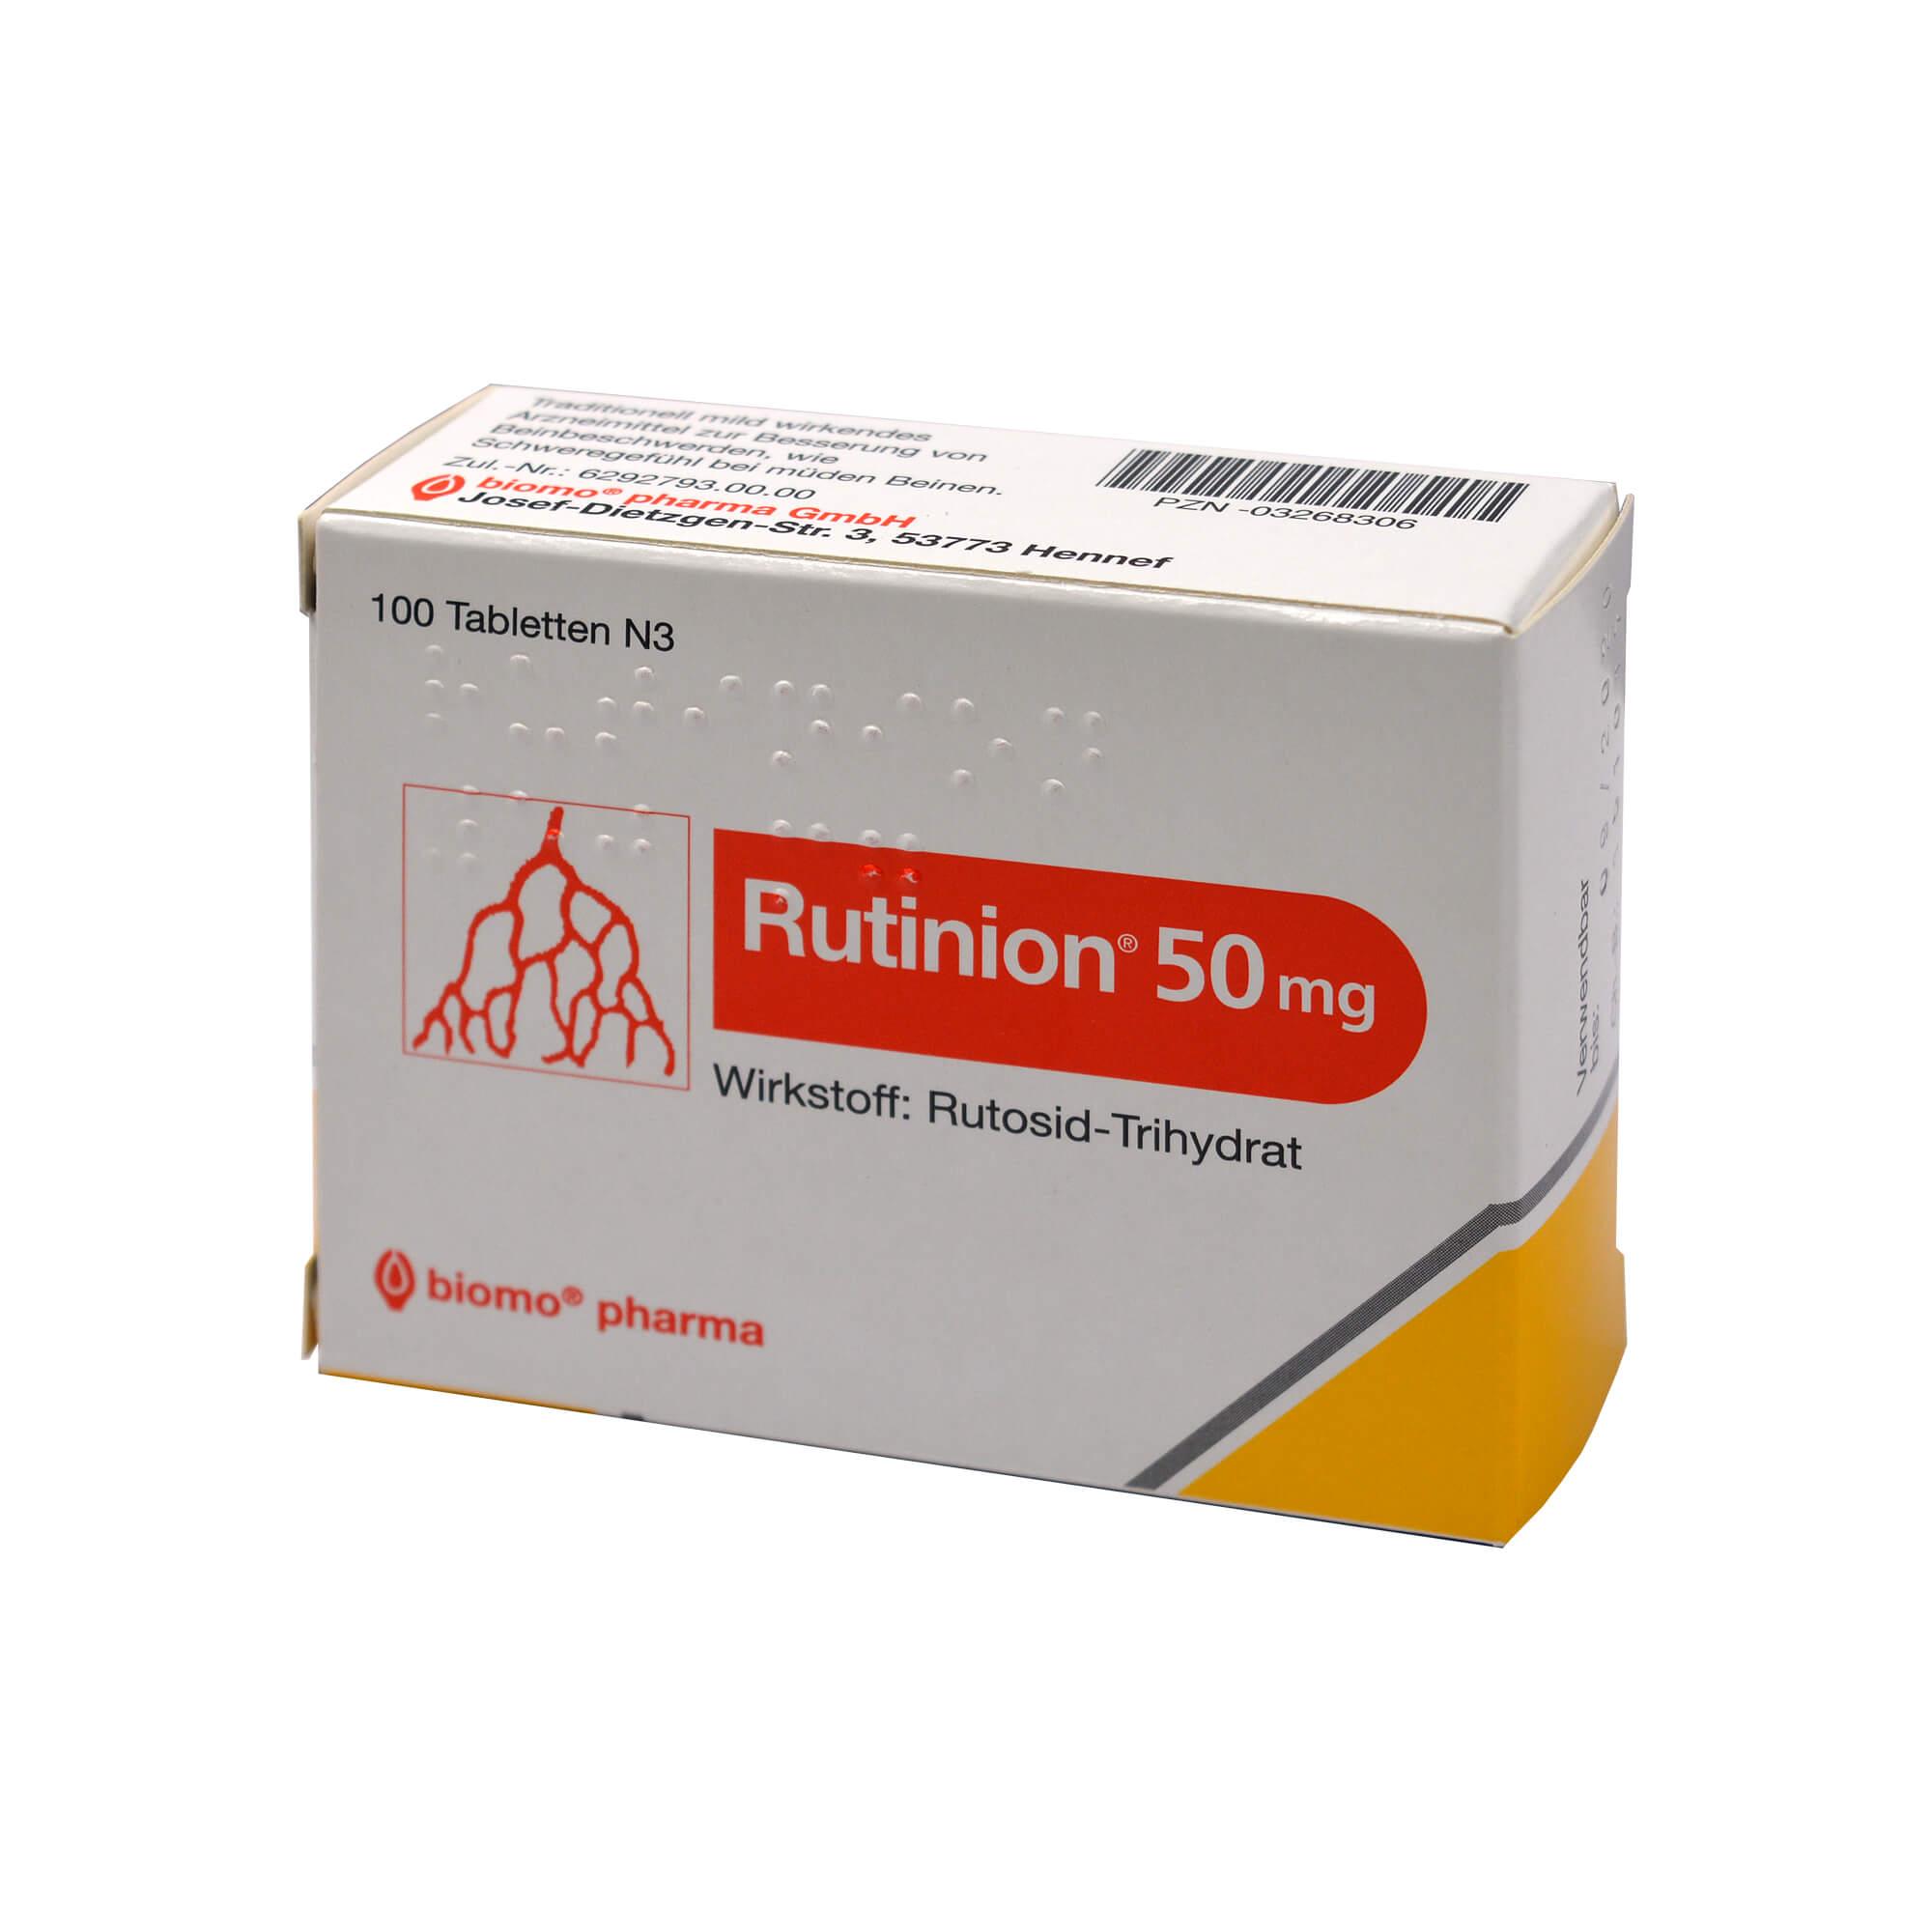 RUTINION